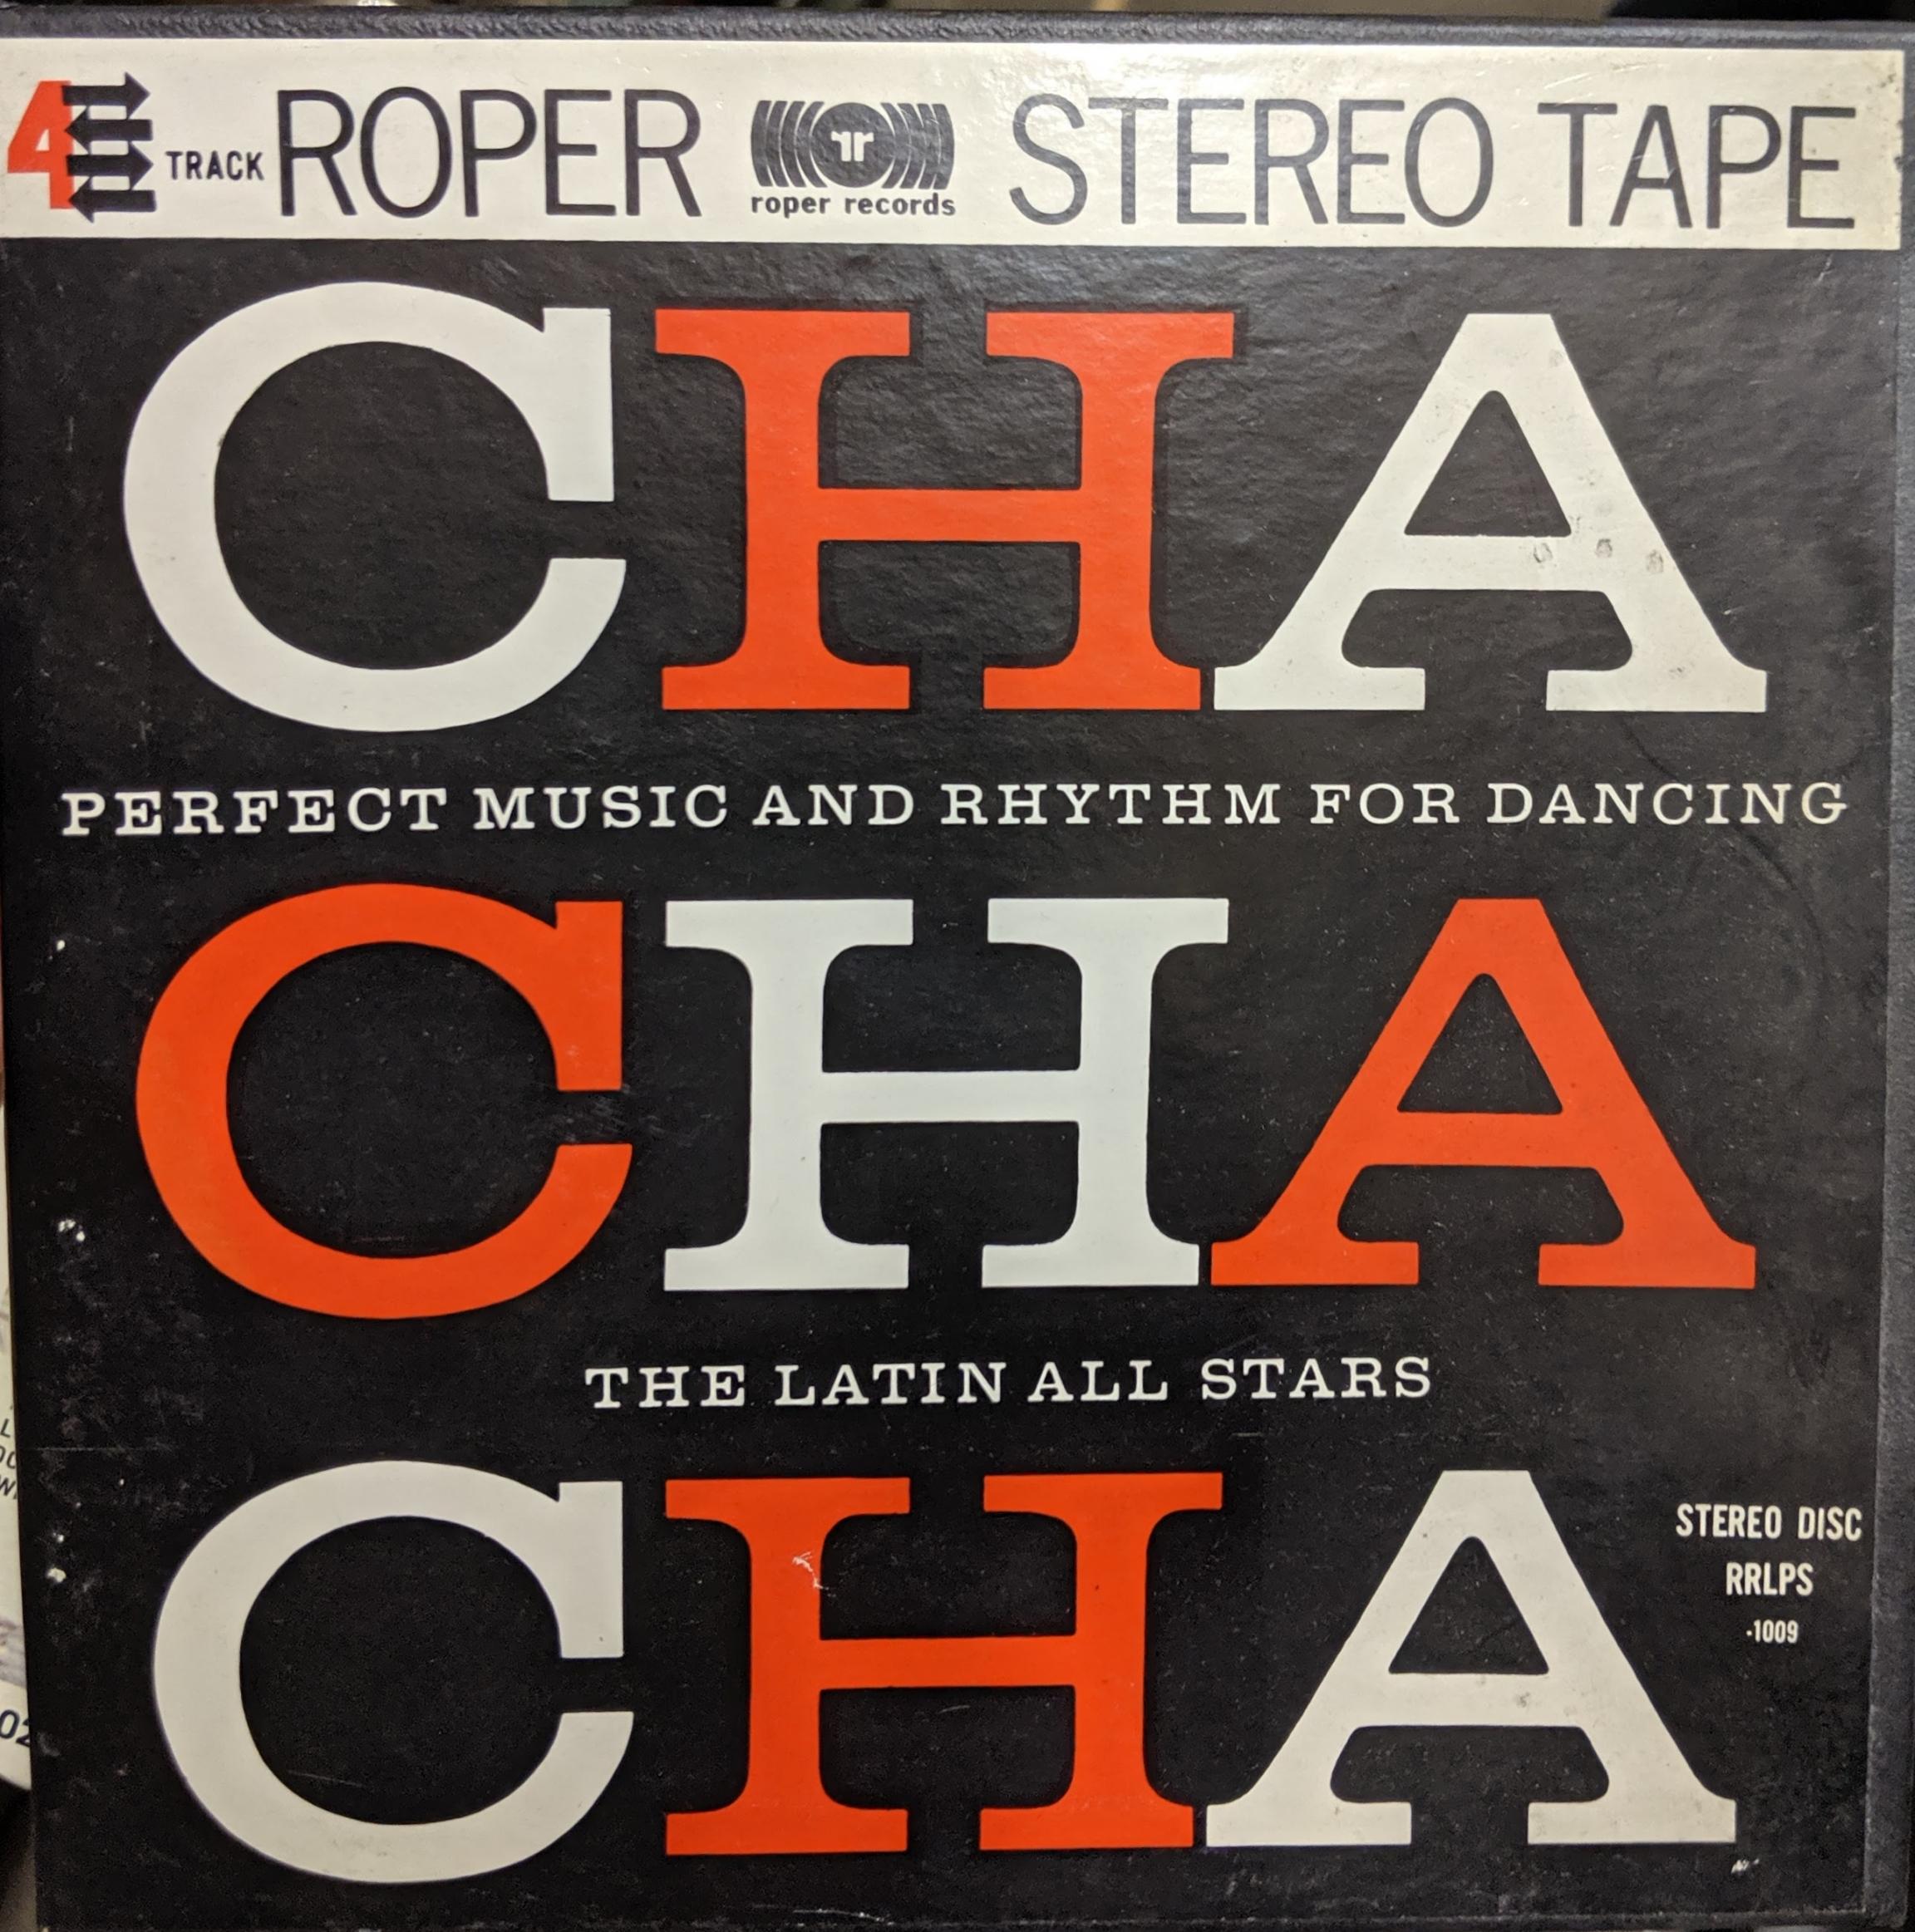 Roper Records